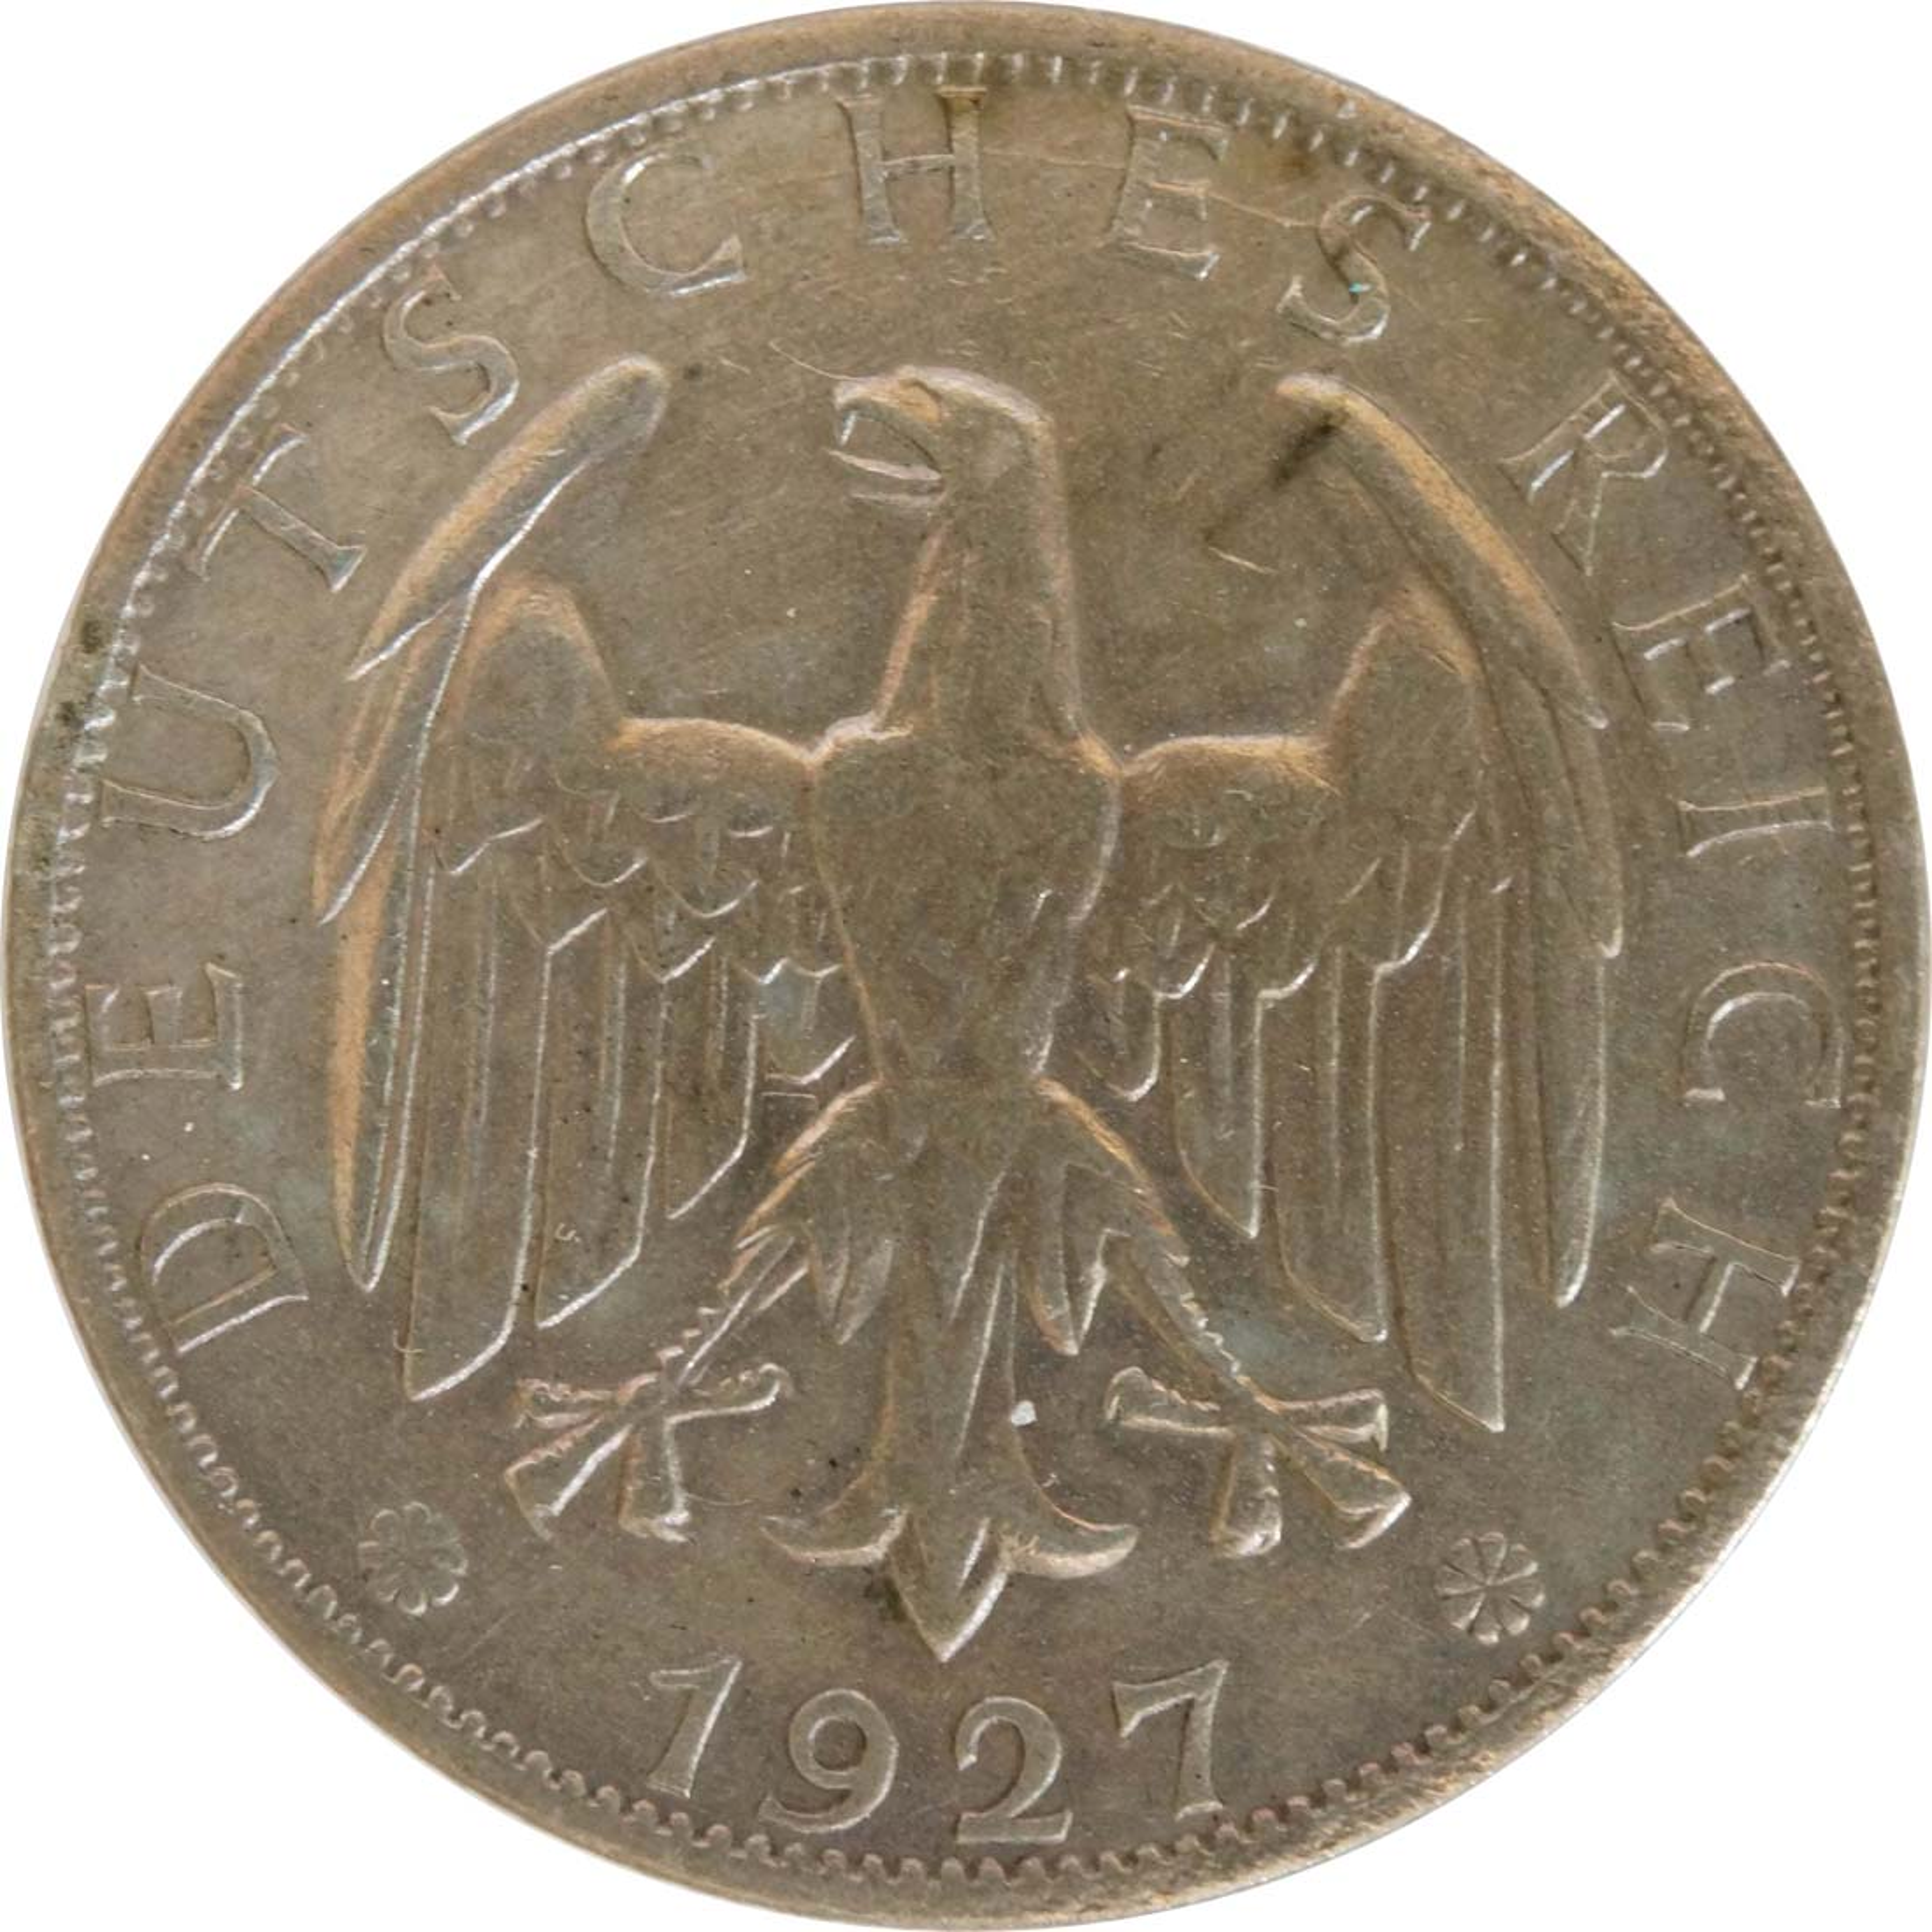 deutschland 2 reichsmark kursmuenze 1927 a silber ss euro. Black Bedroom Furniture Sets. Home Design Ideas